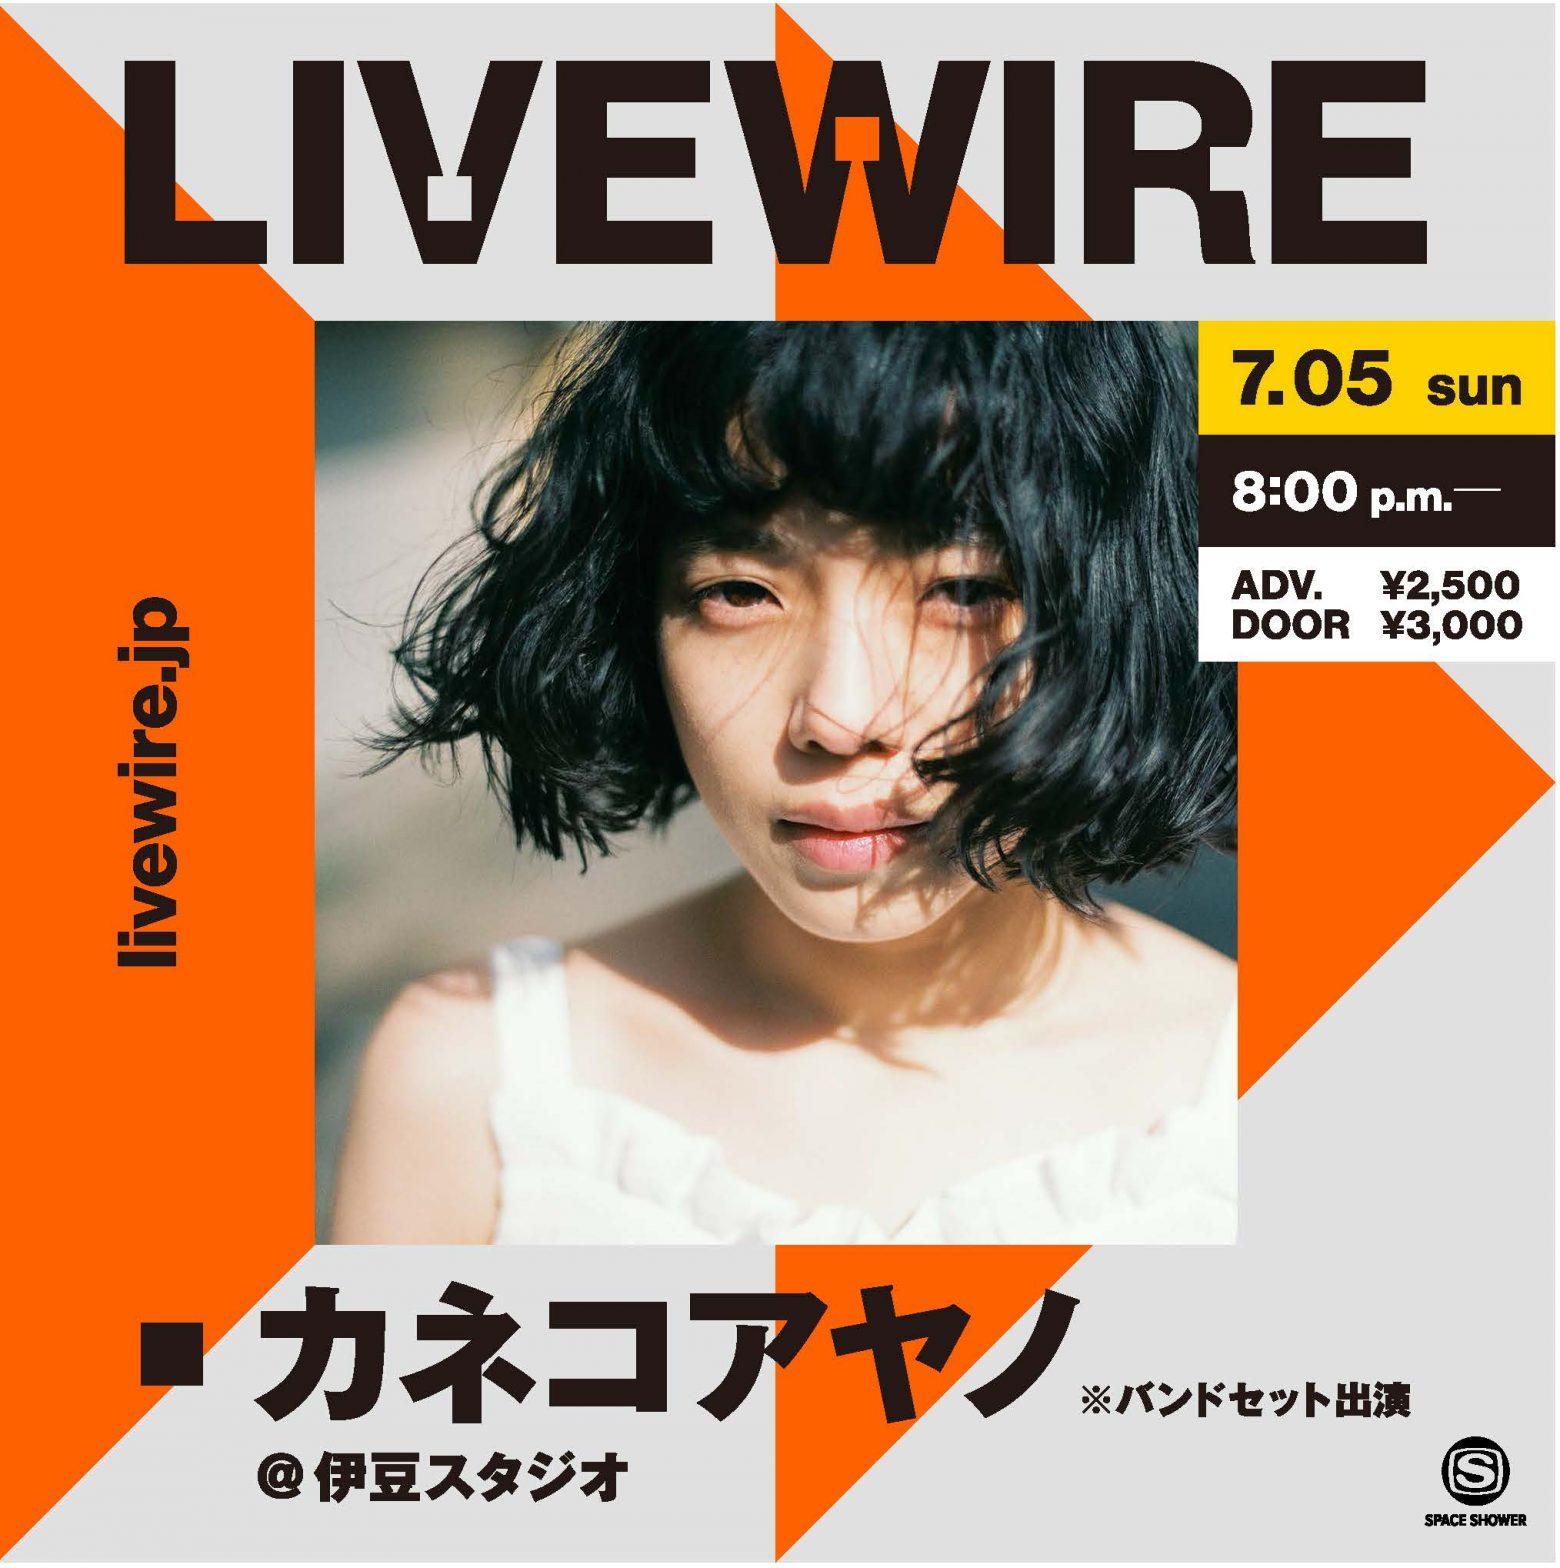 「LIVEWIRE カネコアヤノ@伊豆スタジオ」